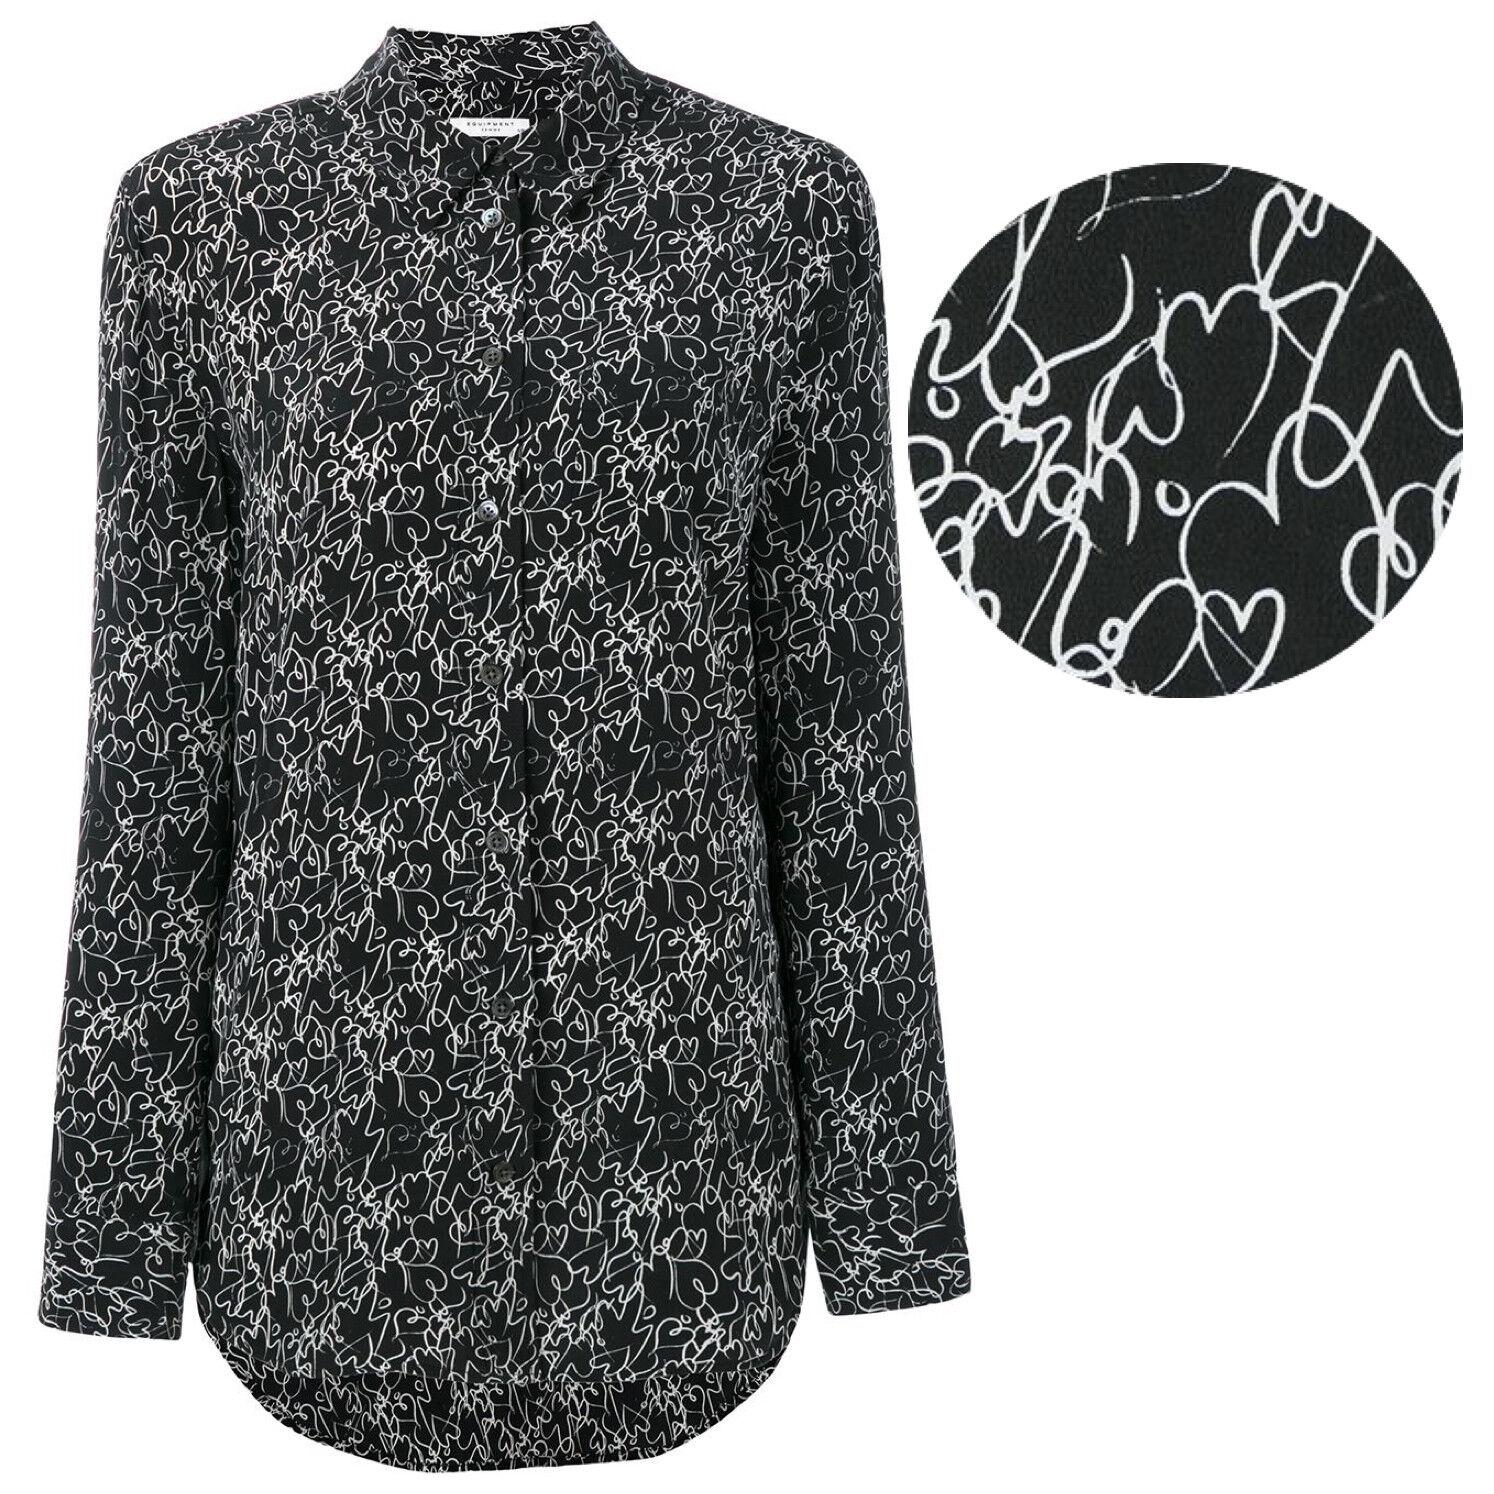 EQUIPMENT Reese Silk Shirt Blouse in True schwarz Heart Print Größe XS